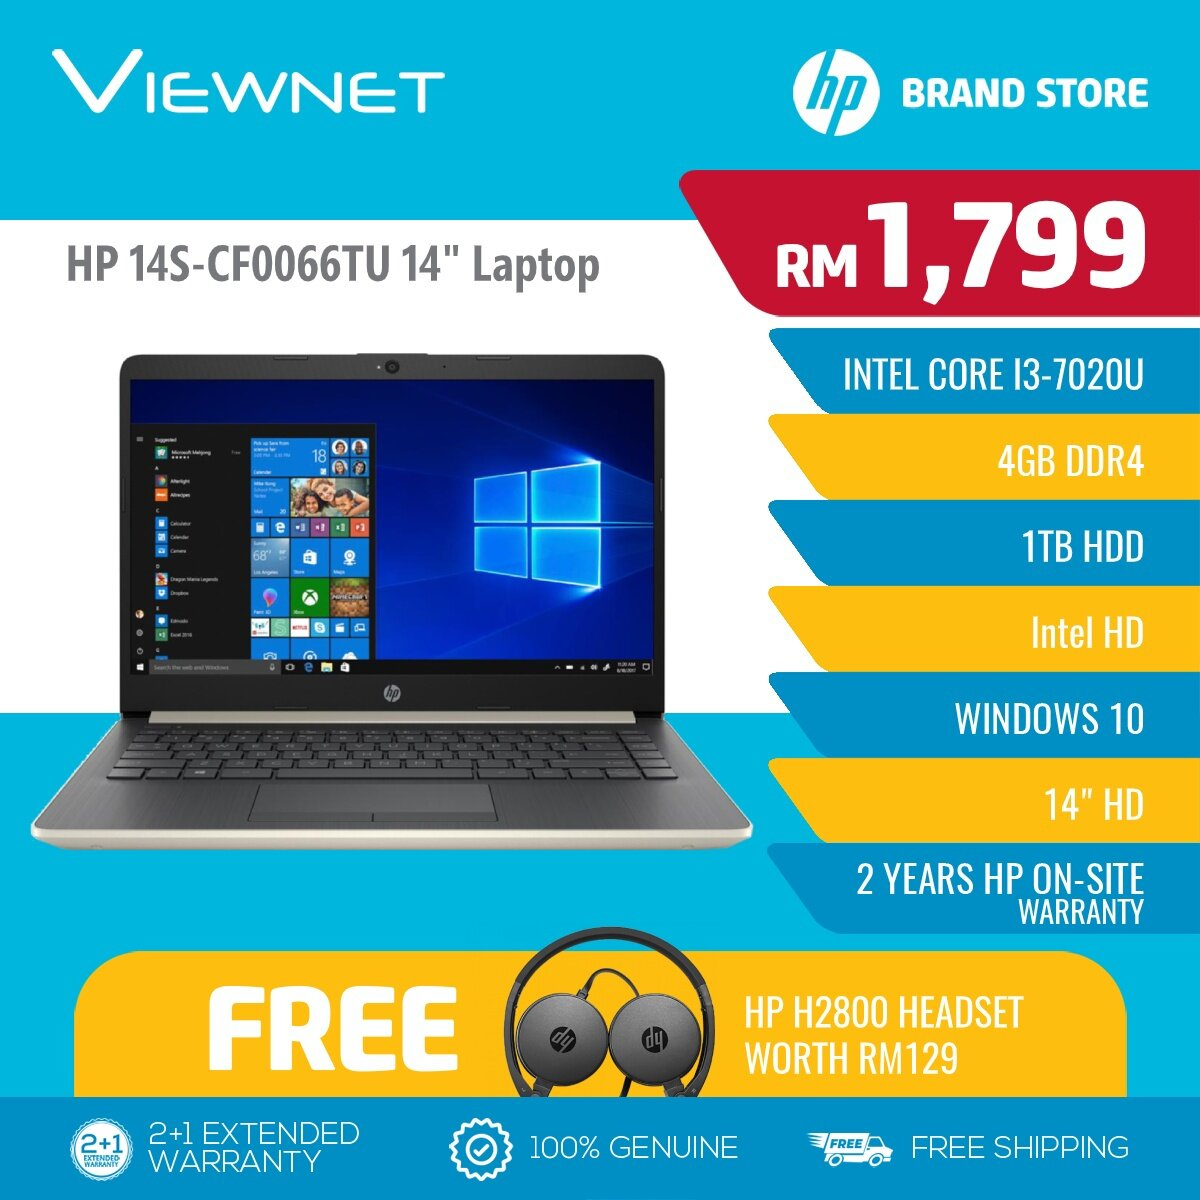 HP 14 Notebook Intel I3-7020U Laptop (14S-CF0066TU Gold / 14S-CF0067TU Silver) 4GB DDR4 RAM, 1TB HDD Storage, Intel HD Graphics 620, Windows 10 Home Malaysia